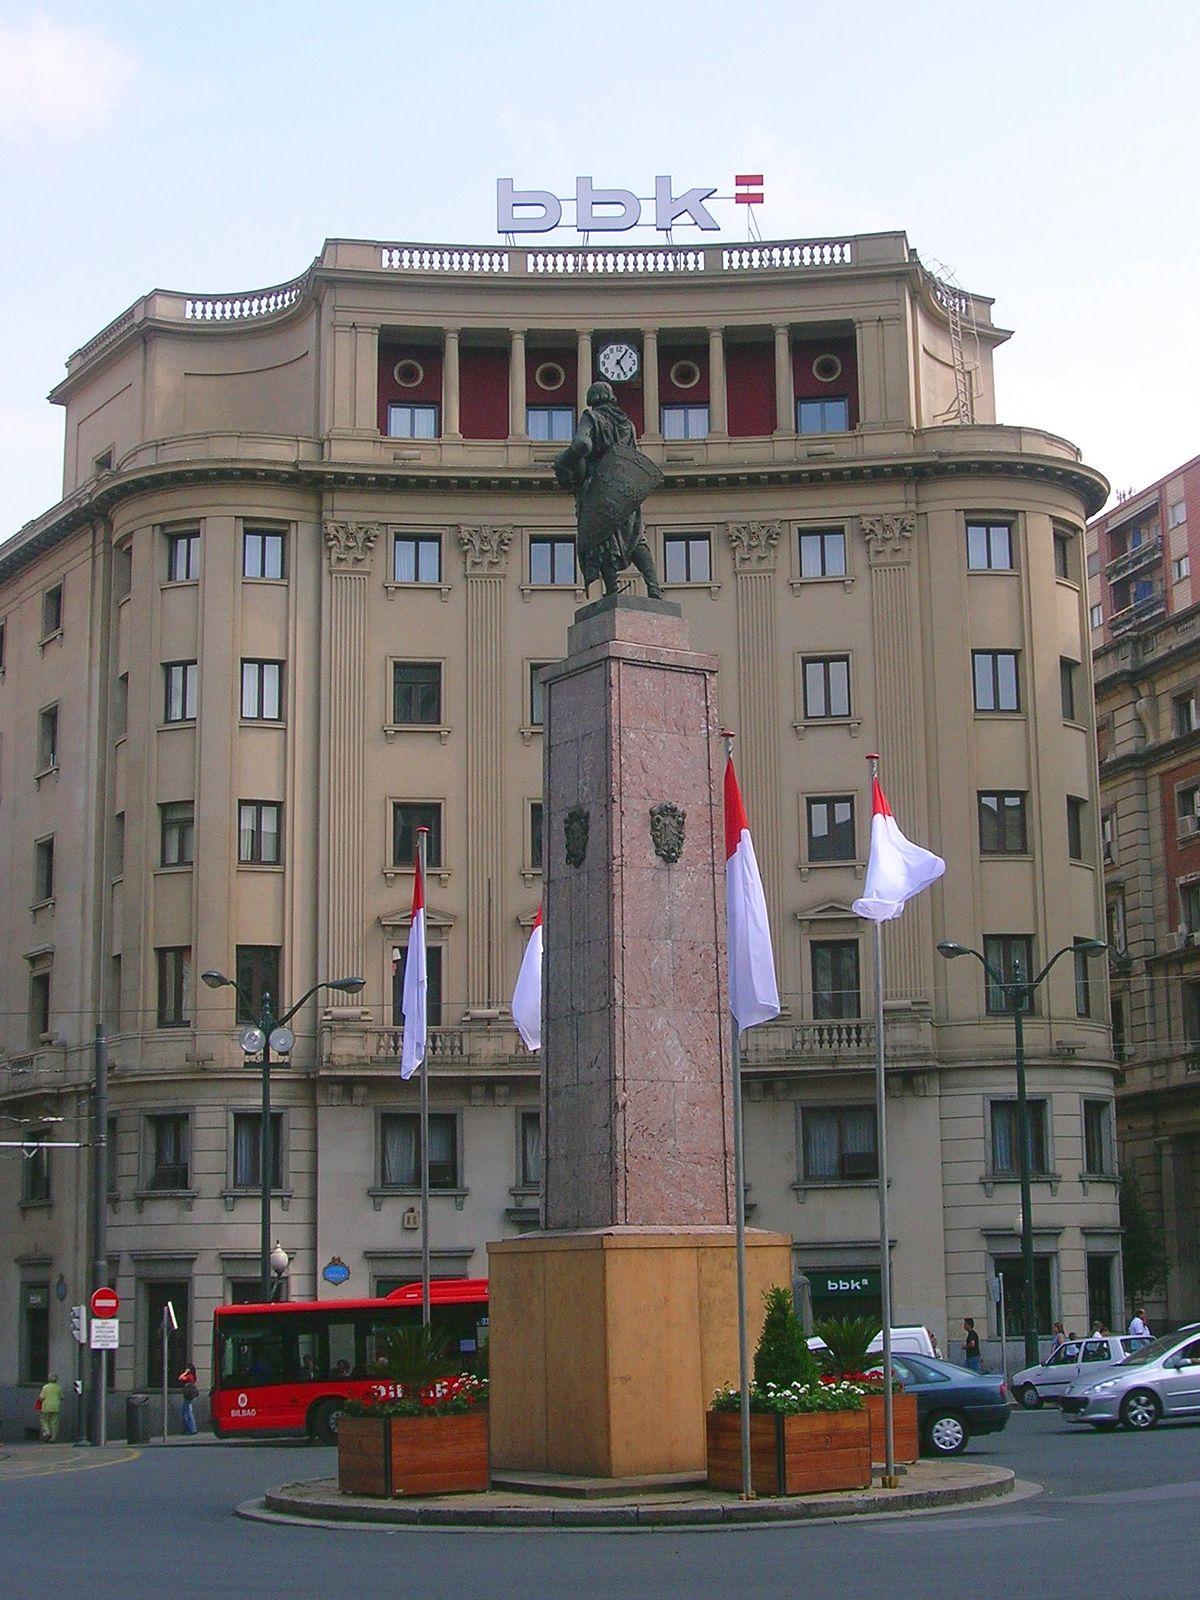 Bilbao bizkaia kutxa wikipedia la enciclopedia libre for Bbk oficina central bilbao